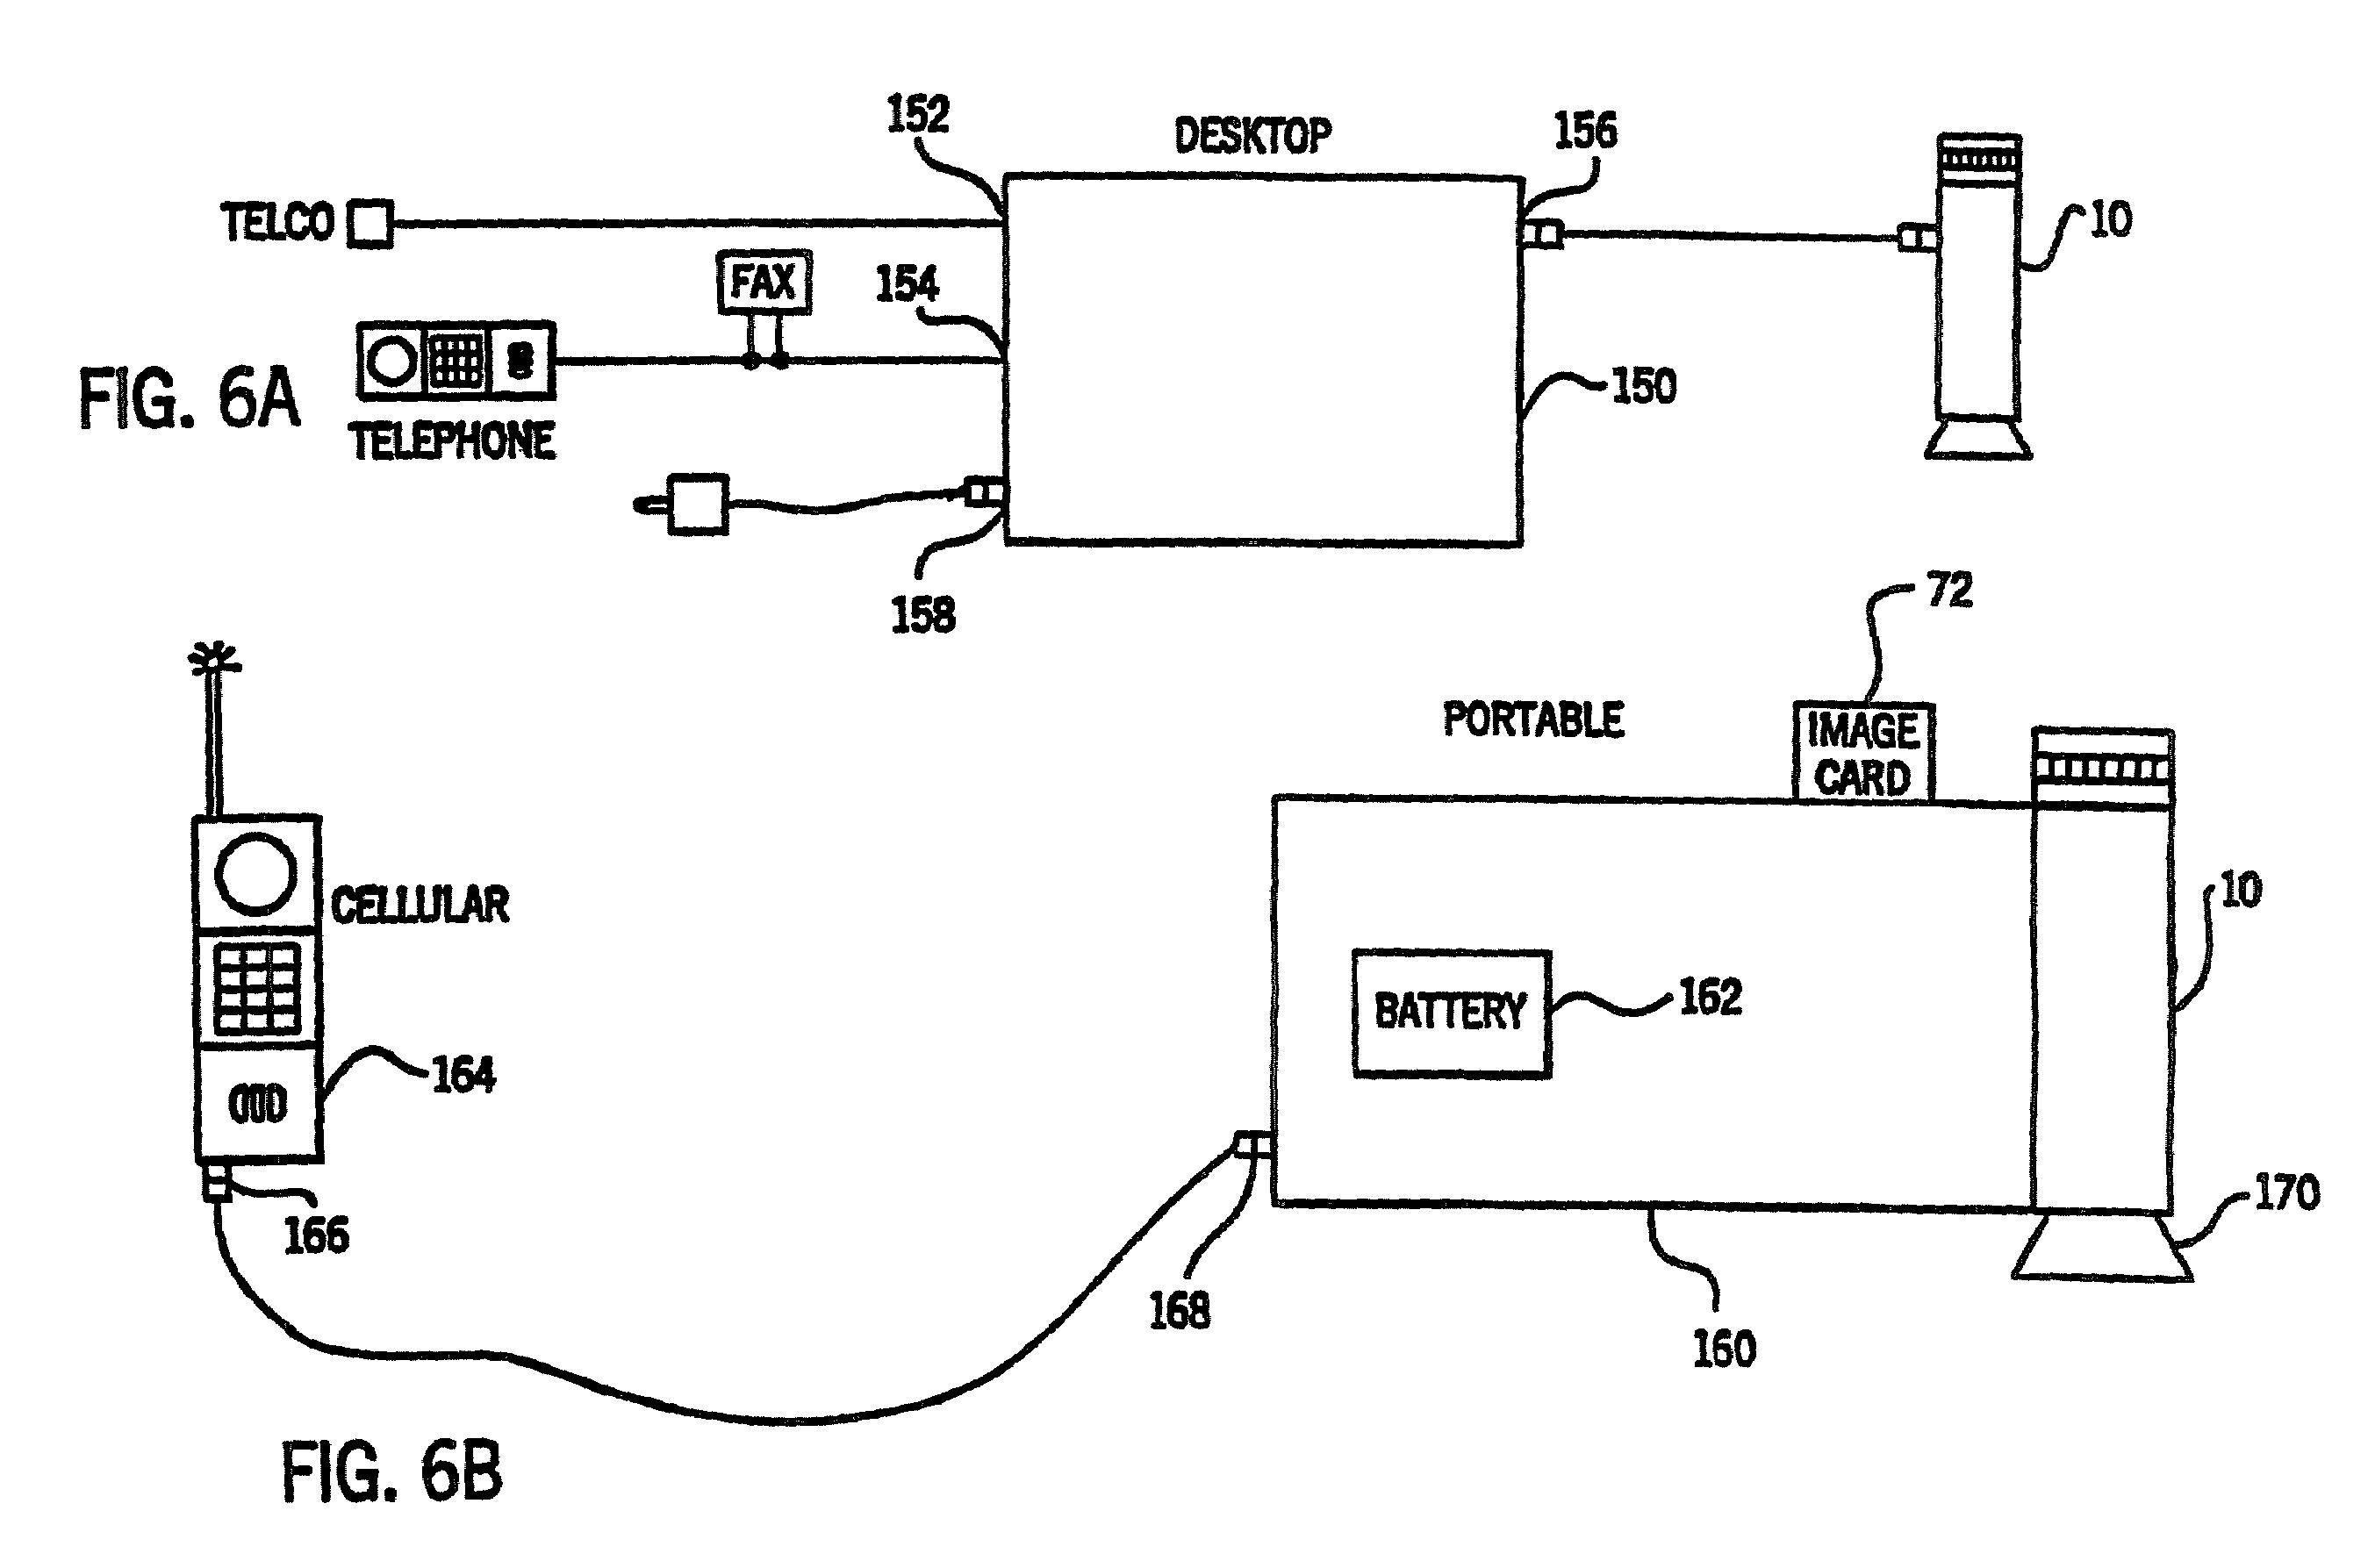 US07643168-20100105-D00006 Xbox One Wireless Controller Wiring Diagram on xbox one power supply specs, xbox 360 controller diagram, xbox one hook up diagram, kinect wiring diagram, xbox headset wiring diagram, xbox one headset adapter, gamecube controller wiring diagram, ps3 controller wiring diagram, xbox one controller pcb diagram, xbox power supply wiring diagram, xbox one controller buttons diagram, xbox 360 power wiring diagram, xbox 360 schematics diagram, xbox one hd pvr 2 connector diagram, xbox one gpu diagram, xbox one kinect diagram, xbox one ports, ps4 and xbox one diagram, xbox one controller circuit board diagram, xbox one esram,